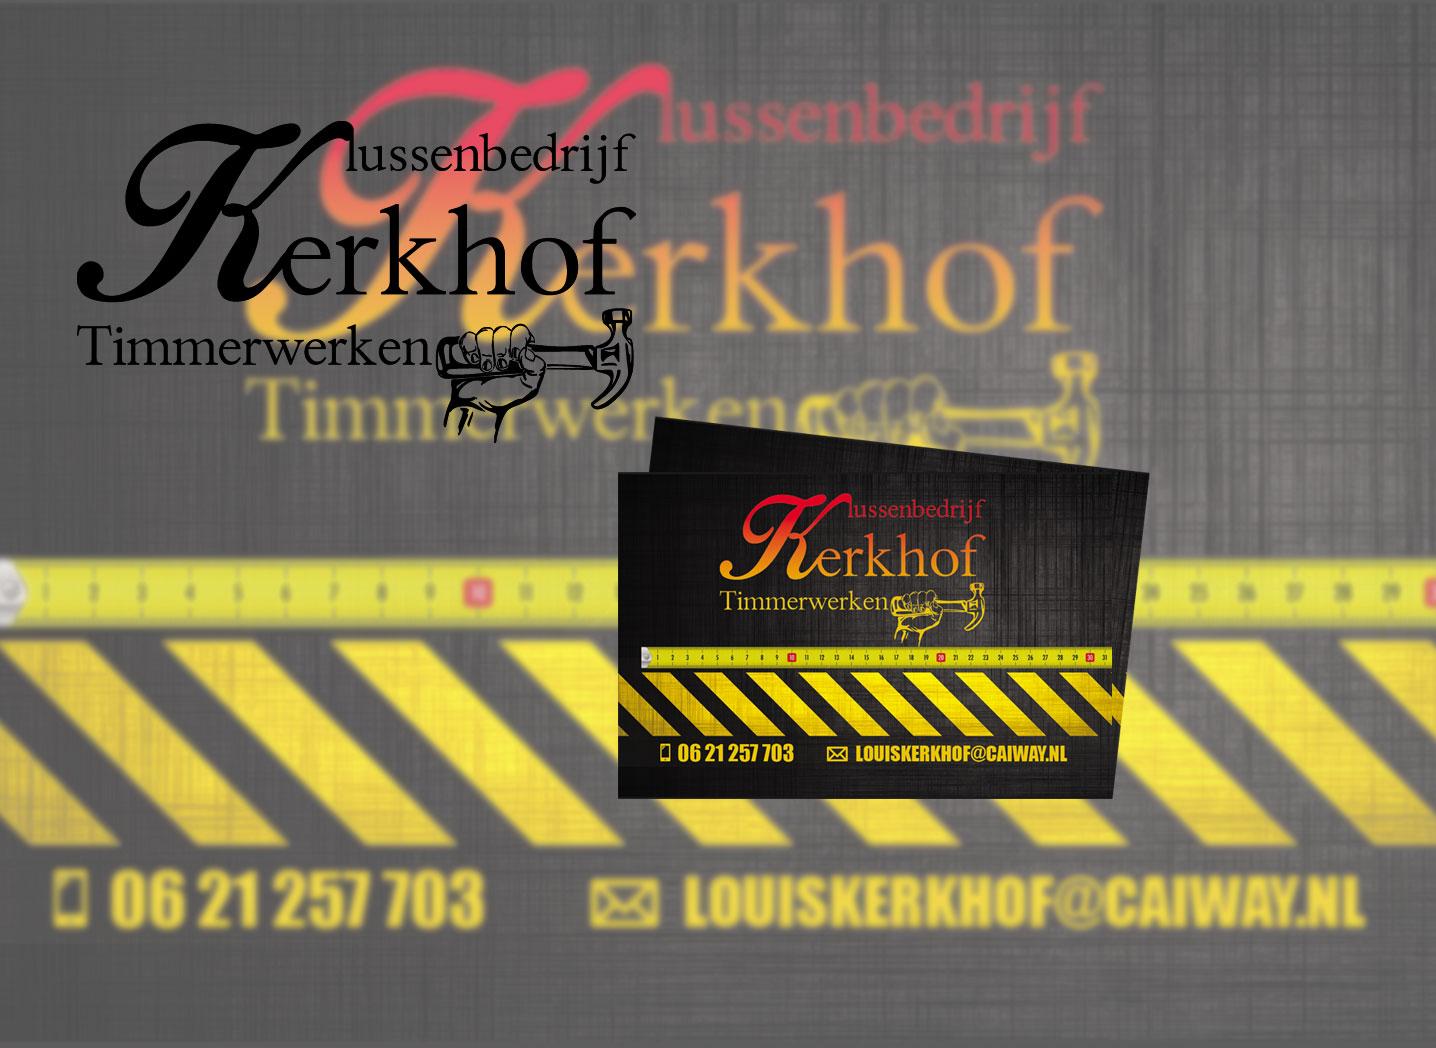 klussenbedrijfkerkhof_portfolio